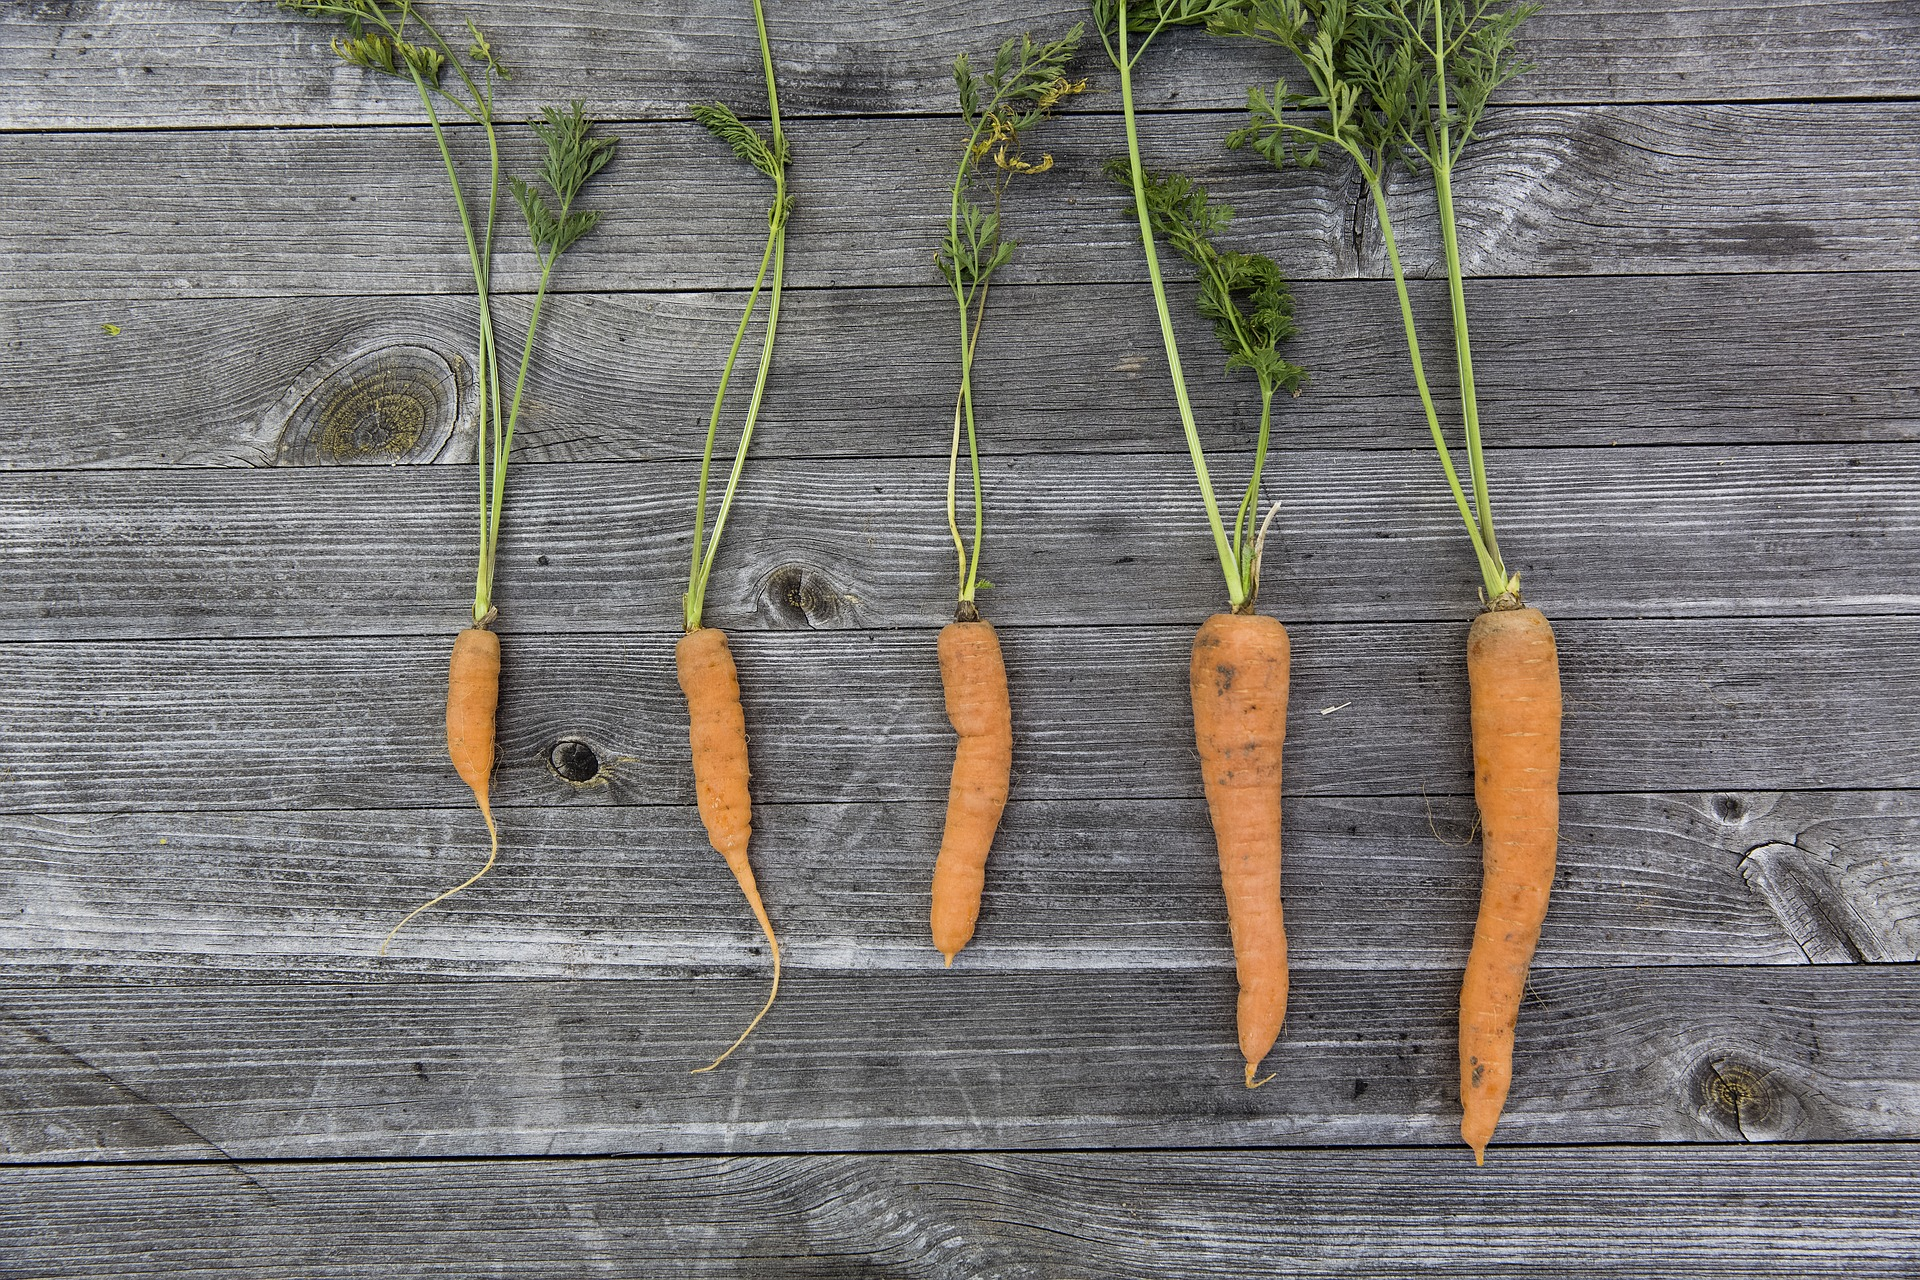 vegetables-1666632_1920.jpg